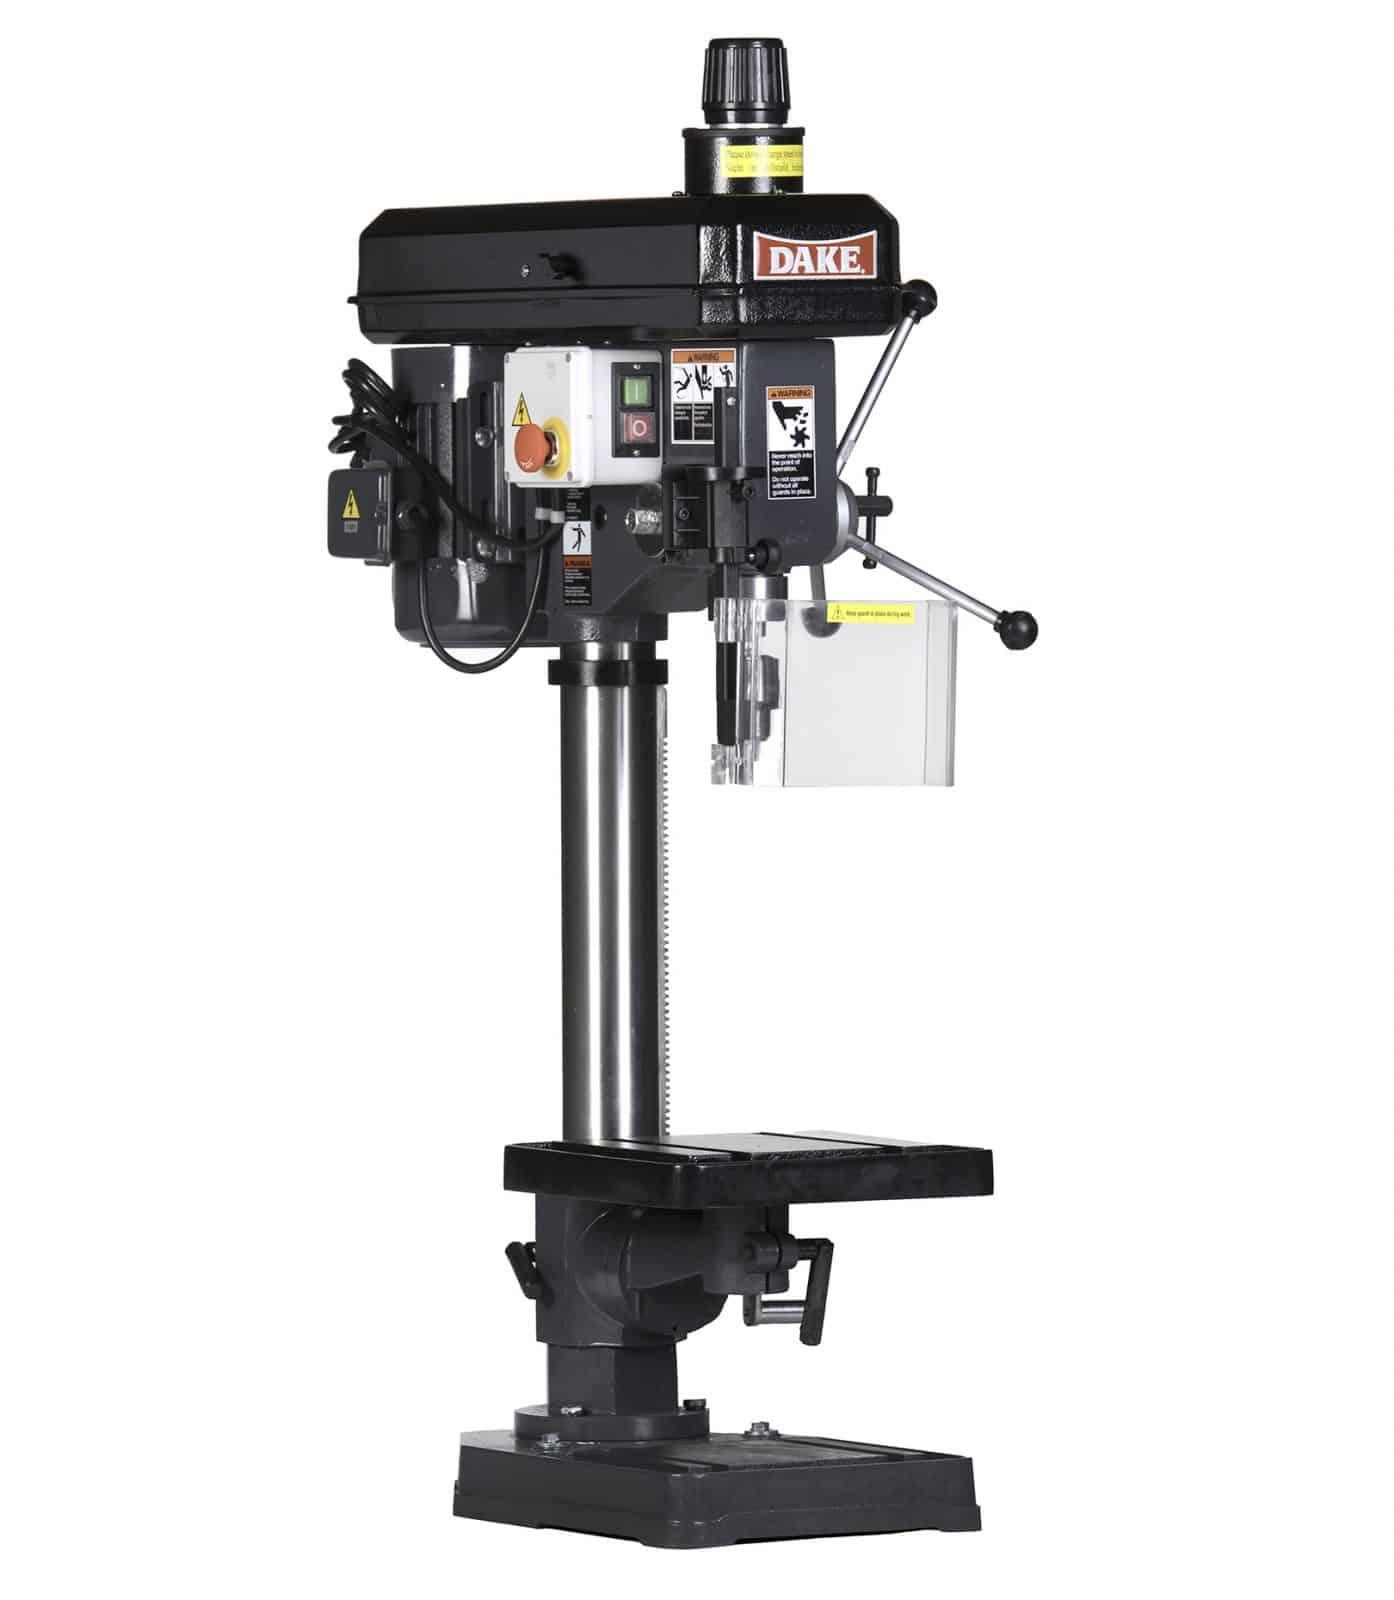 DAKE Metalworking Equipment, Drill Presses